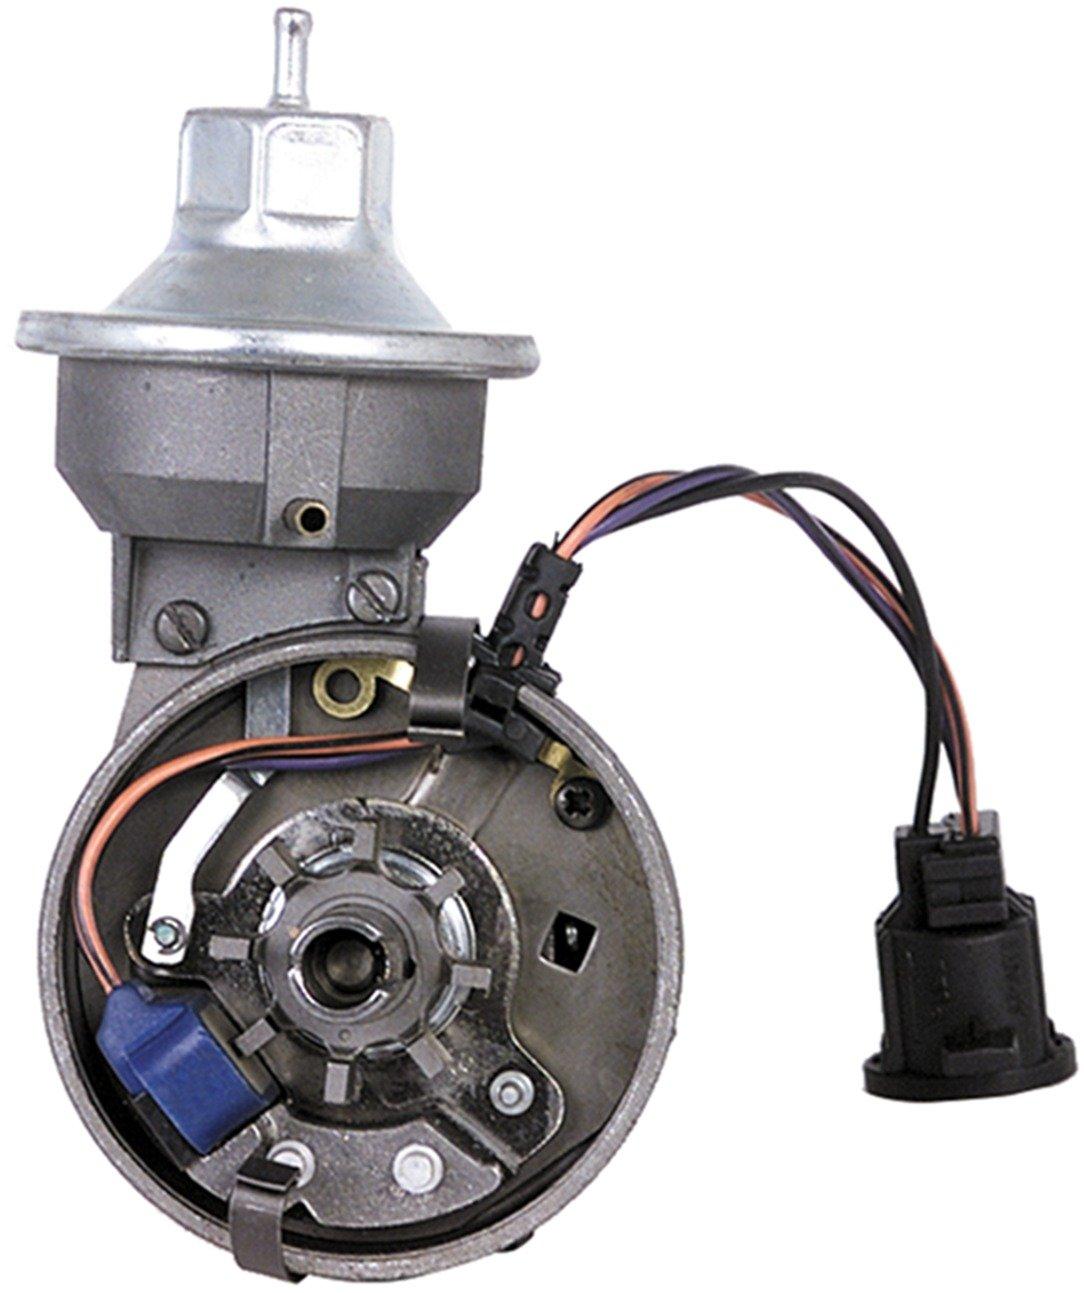 Cardone 30-2879 Remanufactured Ignition Distributor